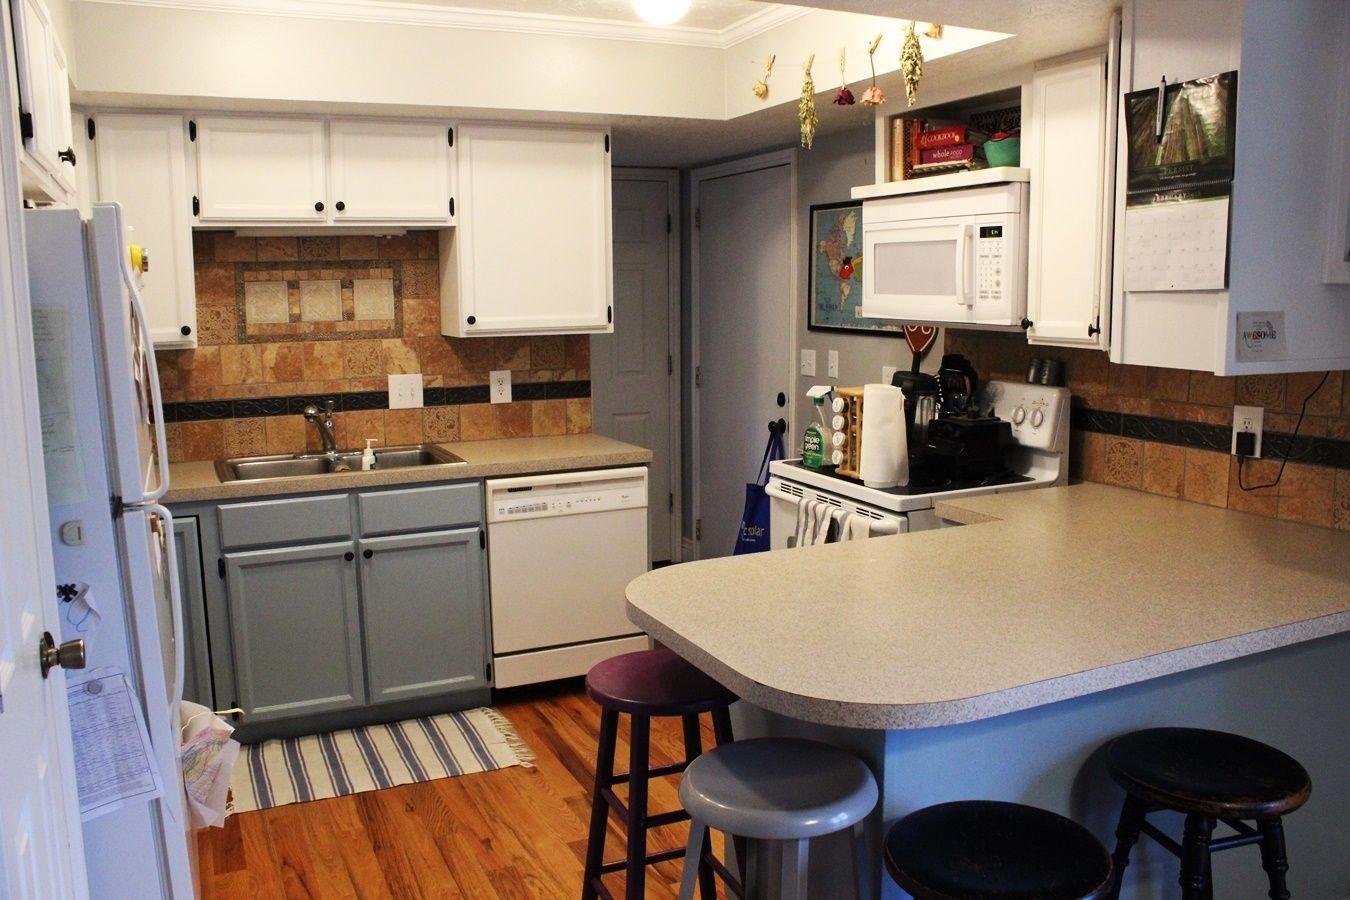 diy concrete countertops concrete kitchen countertops View in gallery